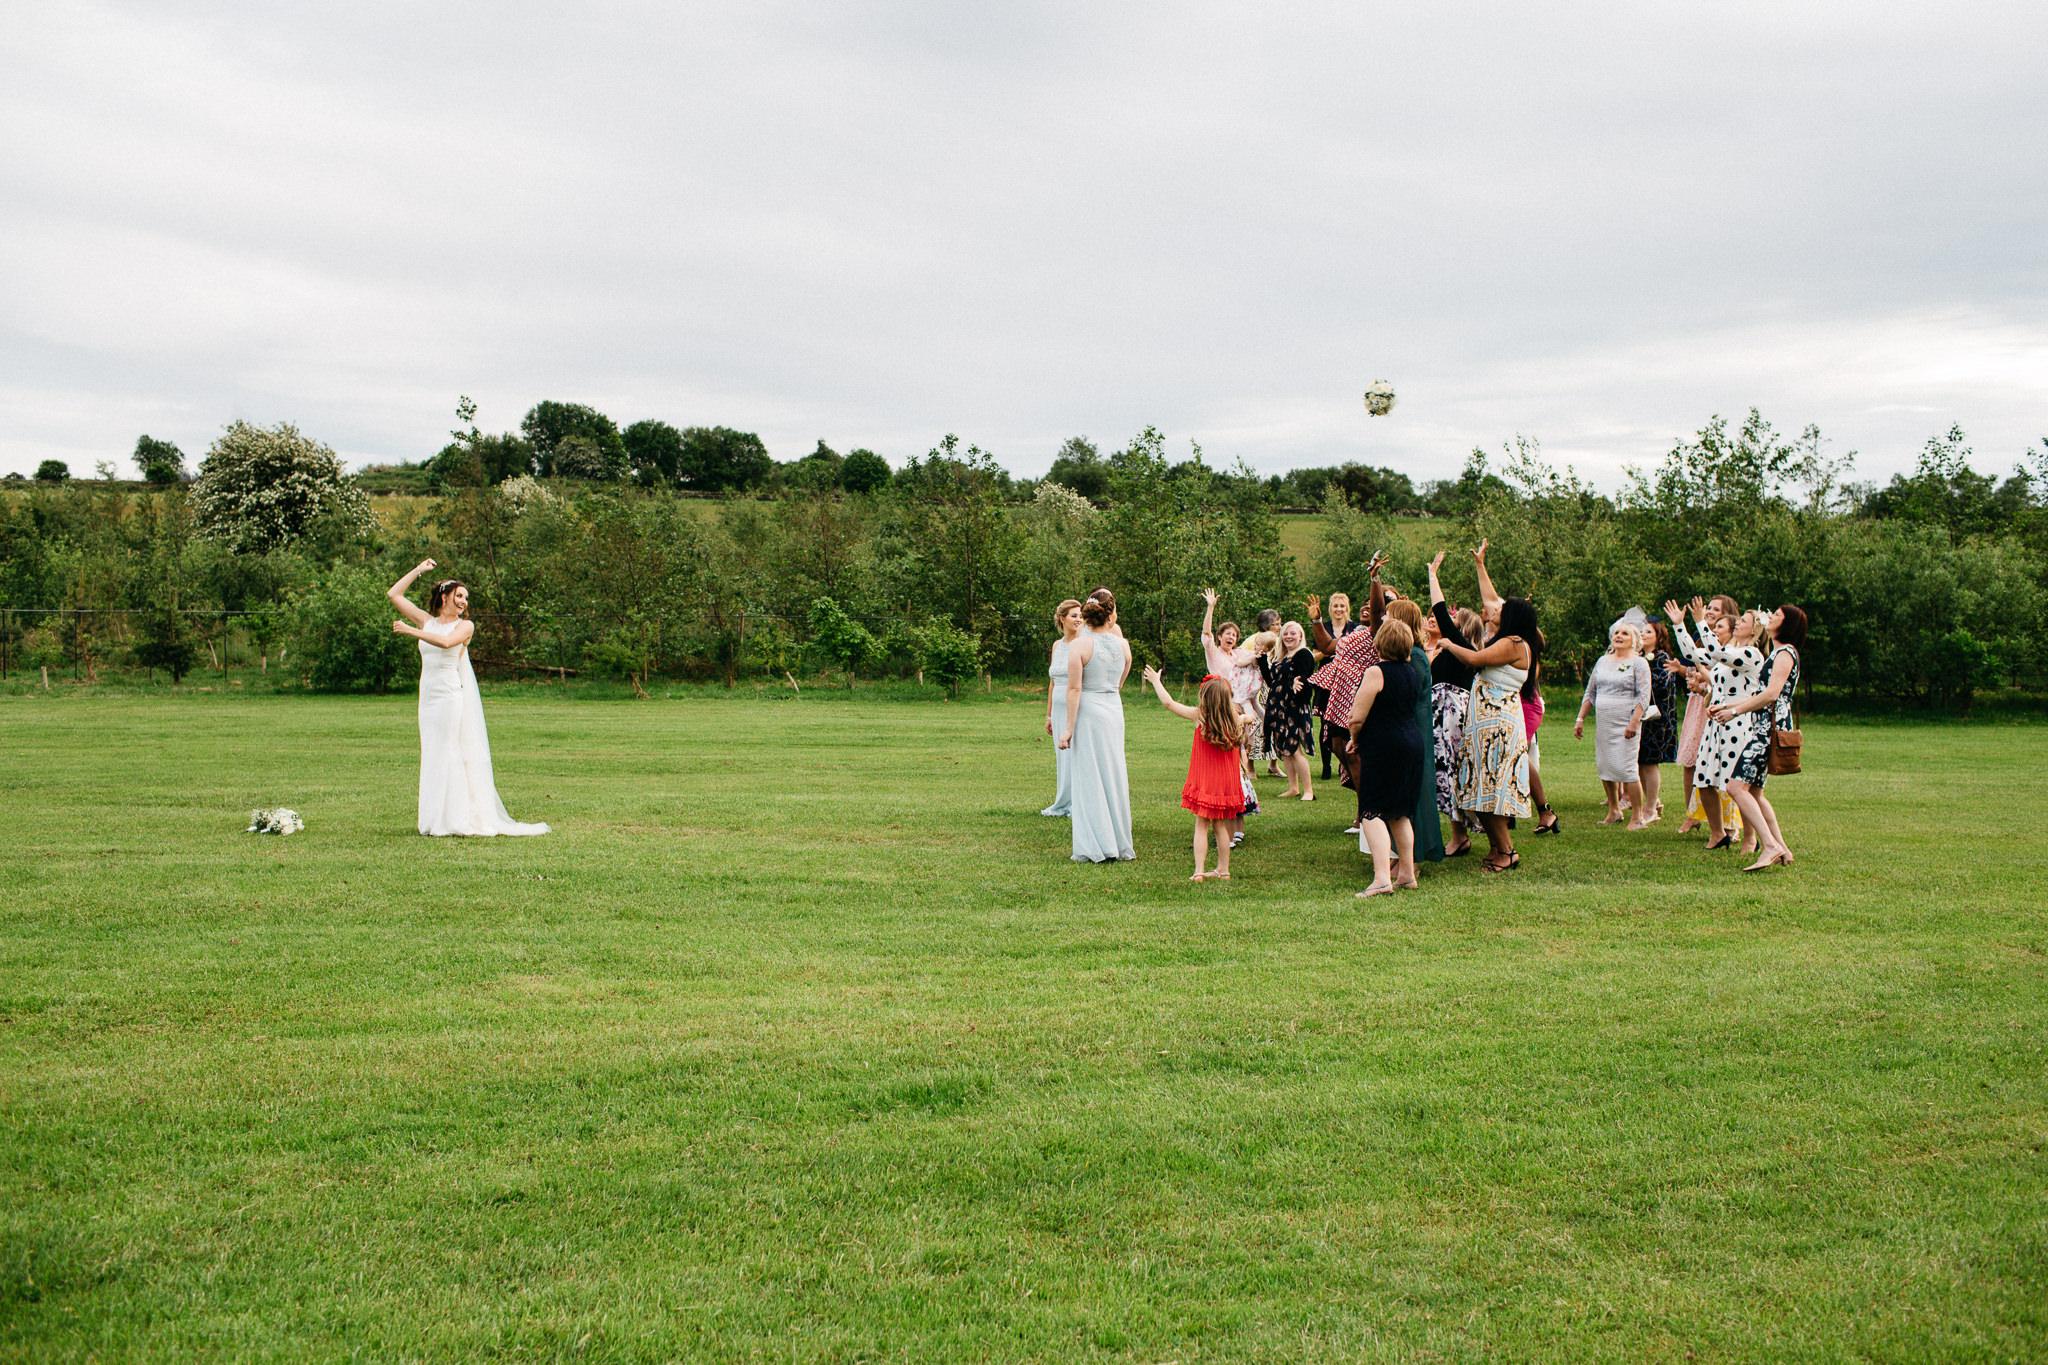 Sheffield_Wedding_Photographer (42 of 44)